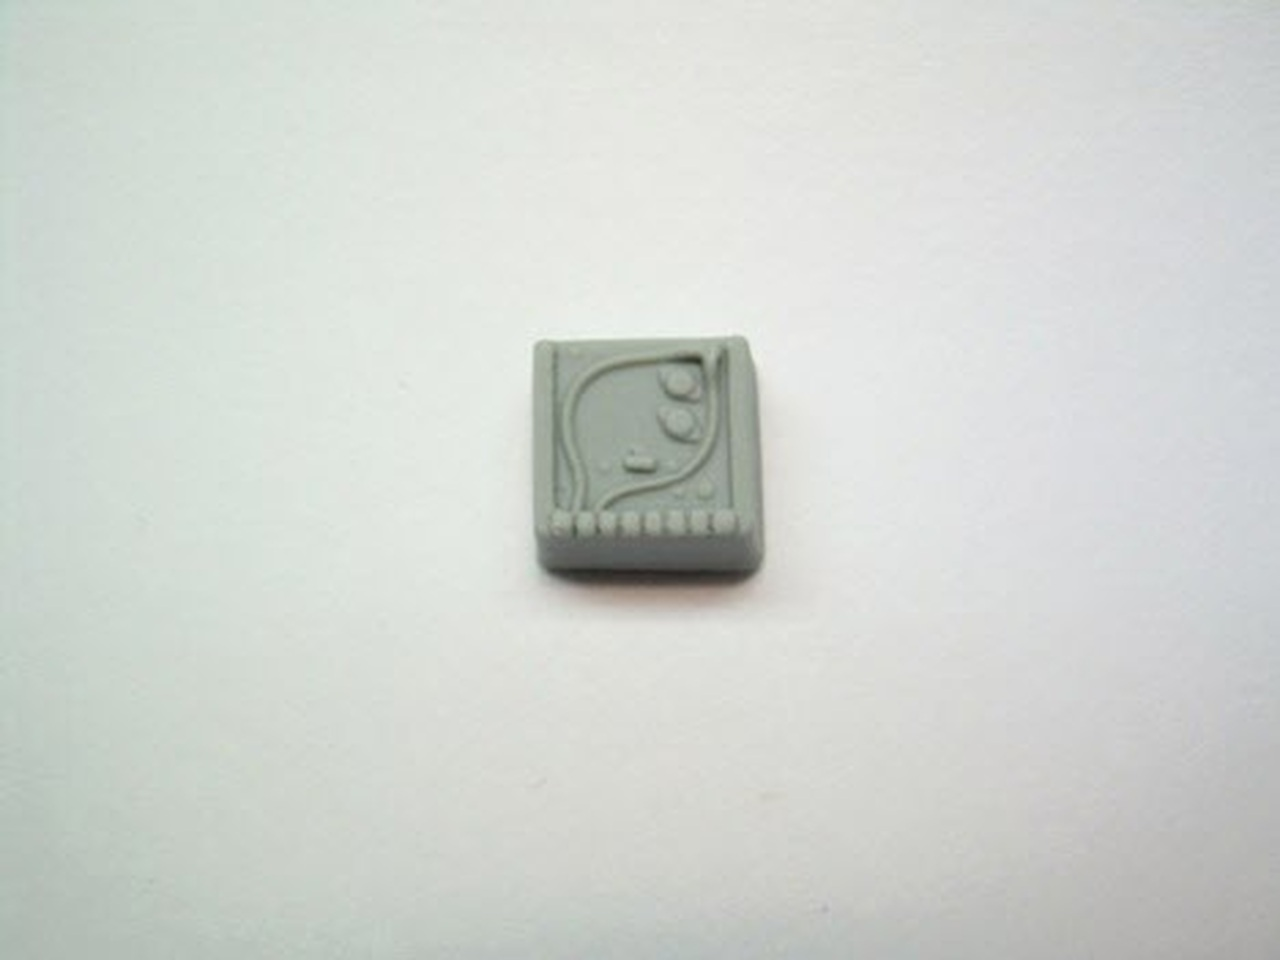 MSD 7 Ignition Box 1/16